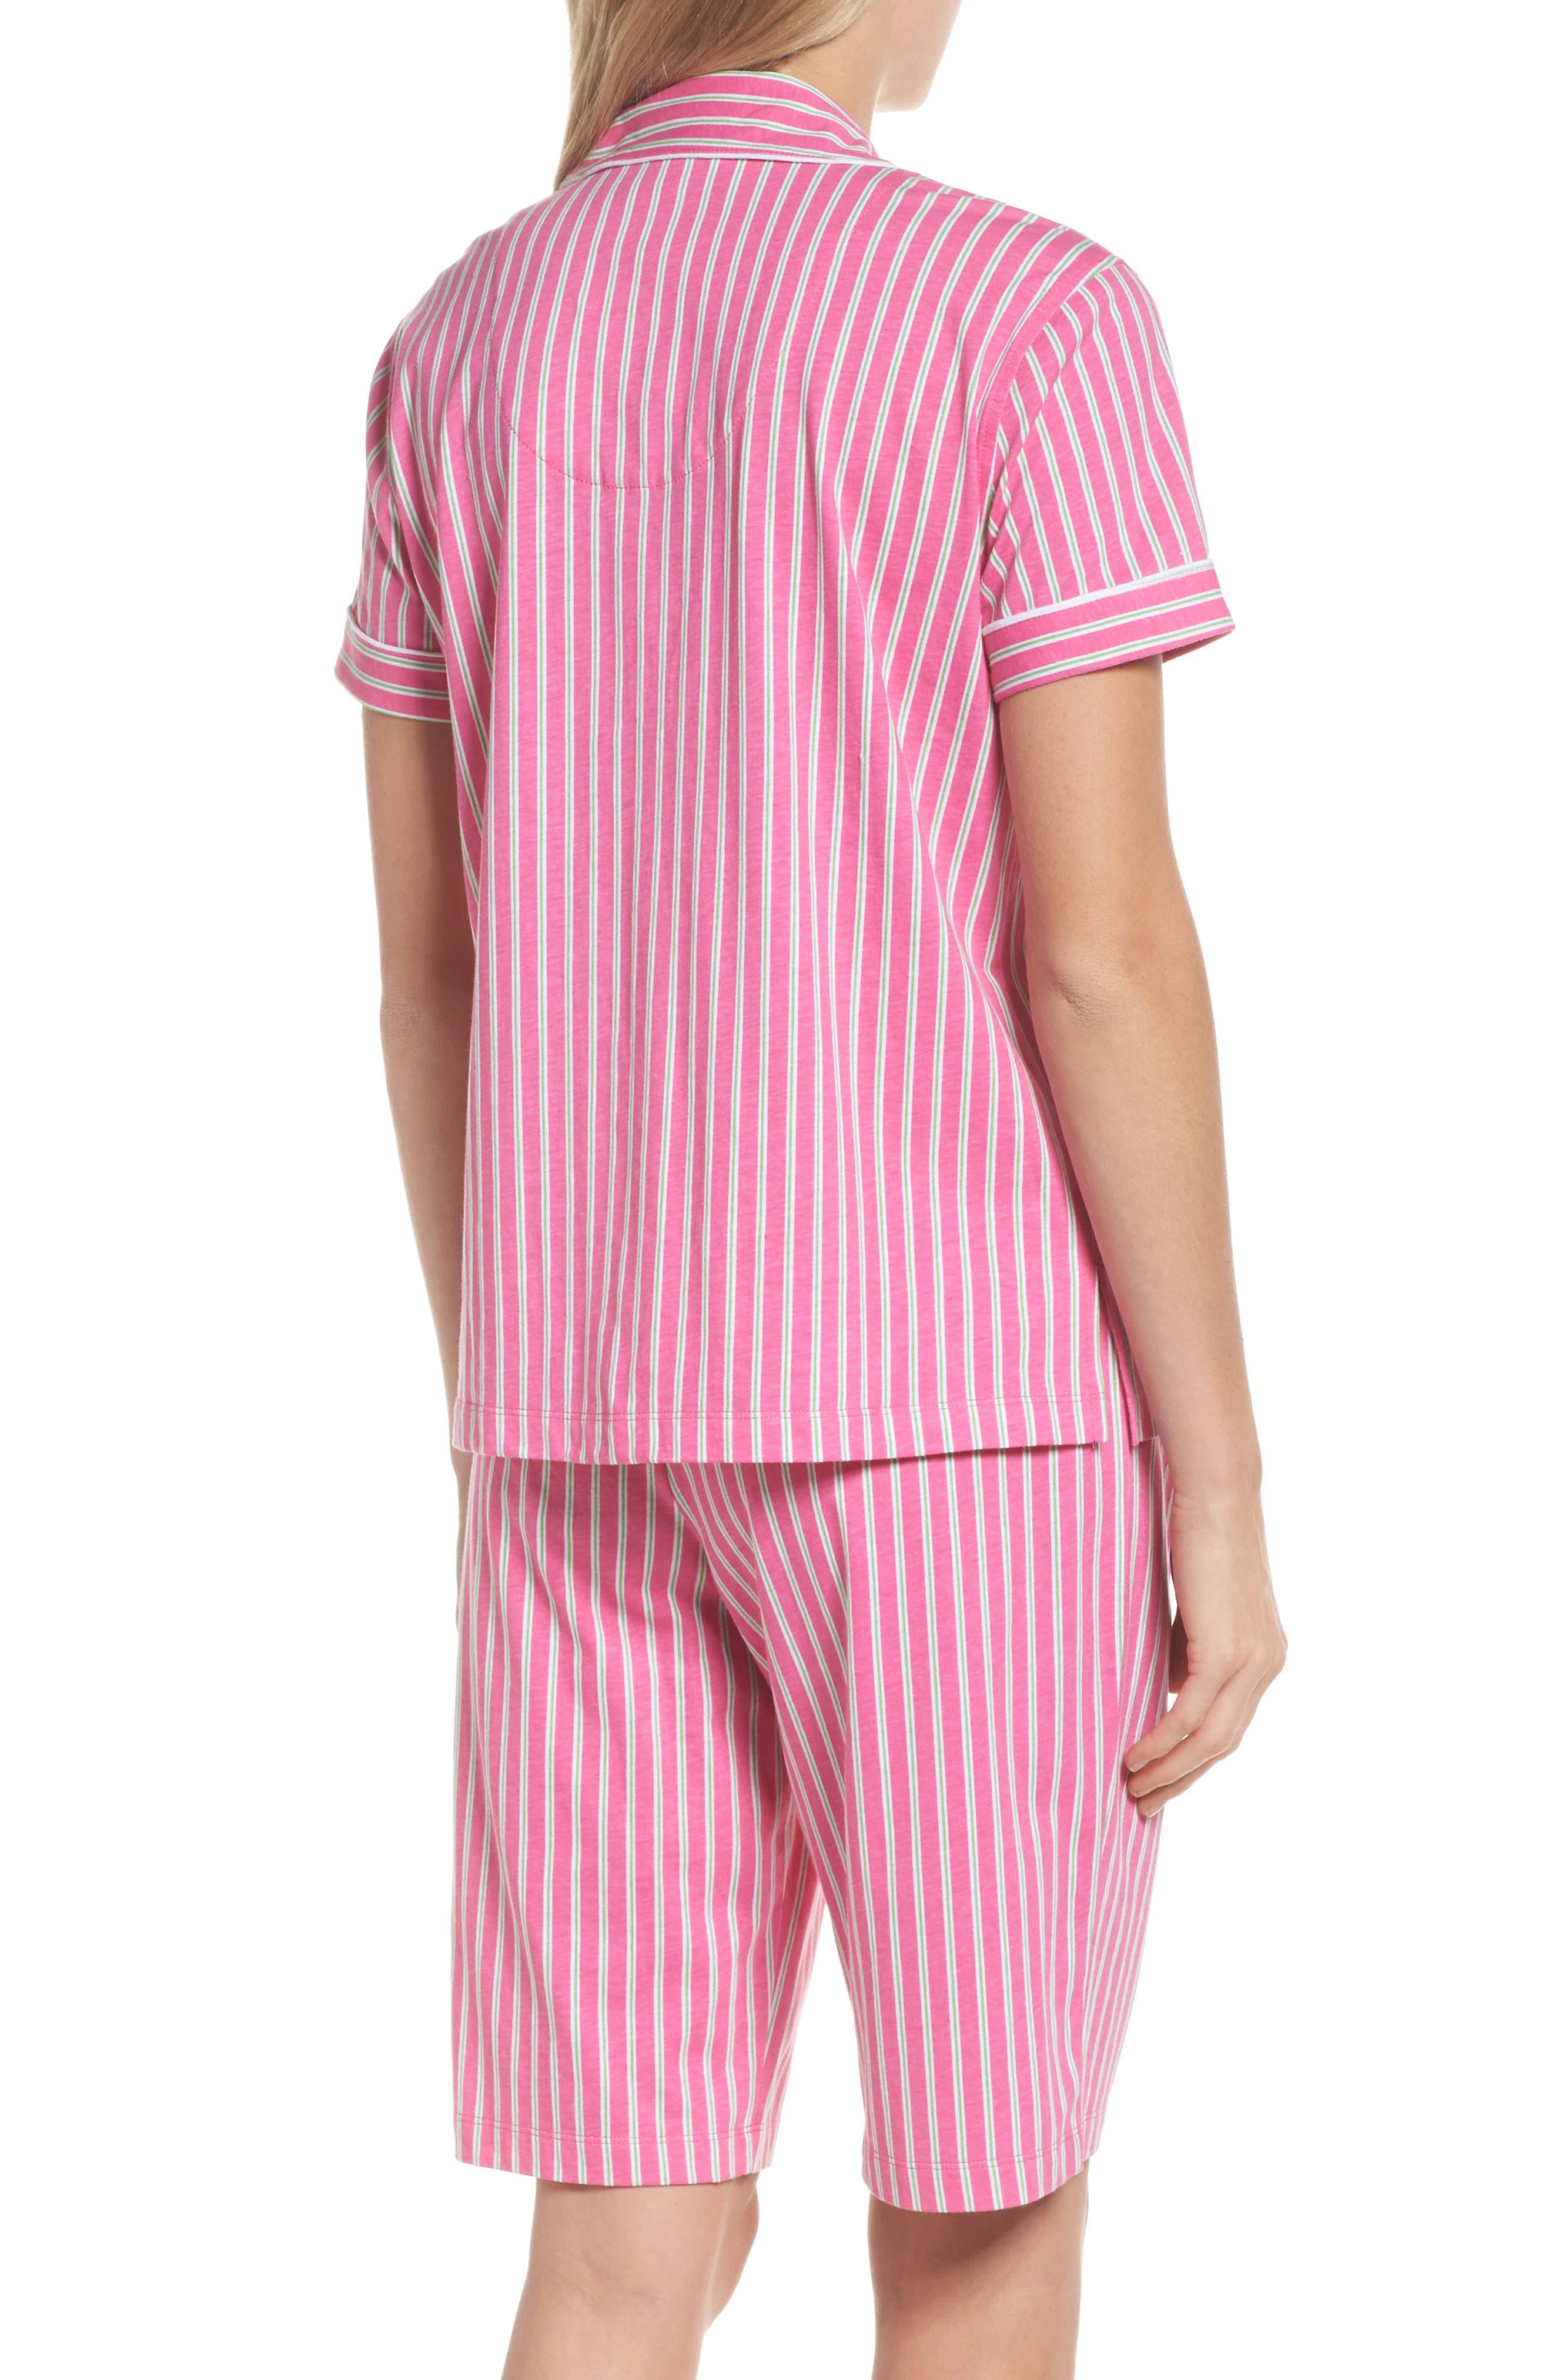 Bermuda Pajamas,                             Alternate thumbnail 2, color,                             Pink Stripe